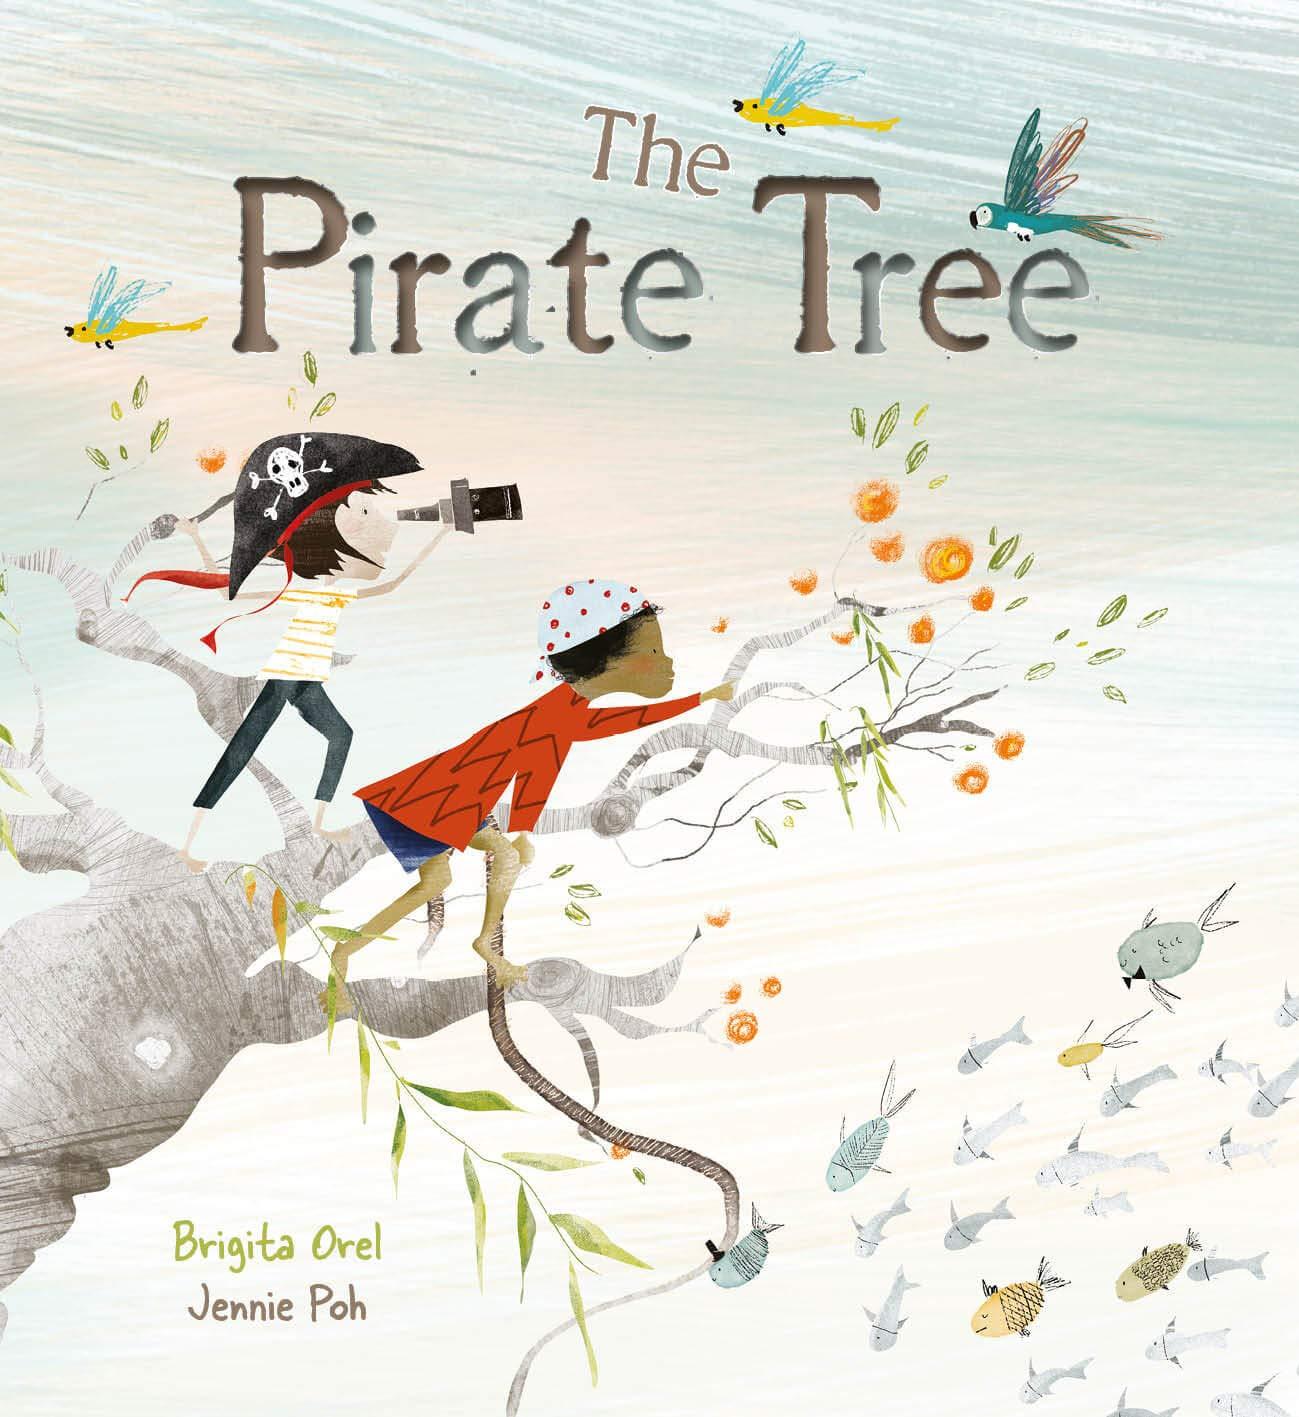 the pirate tree